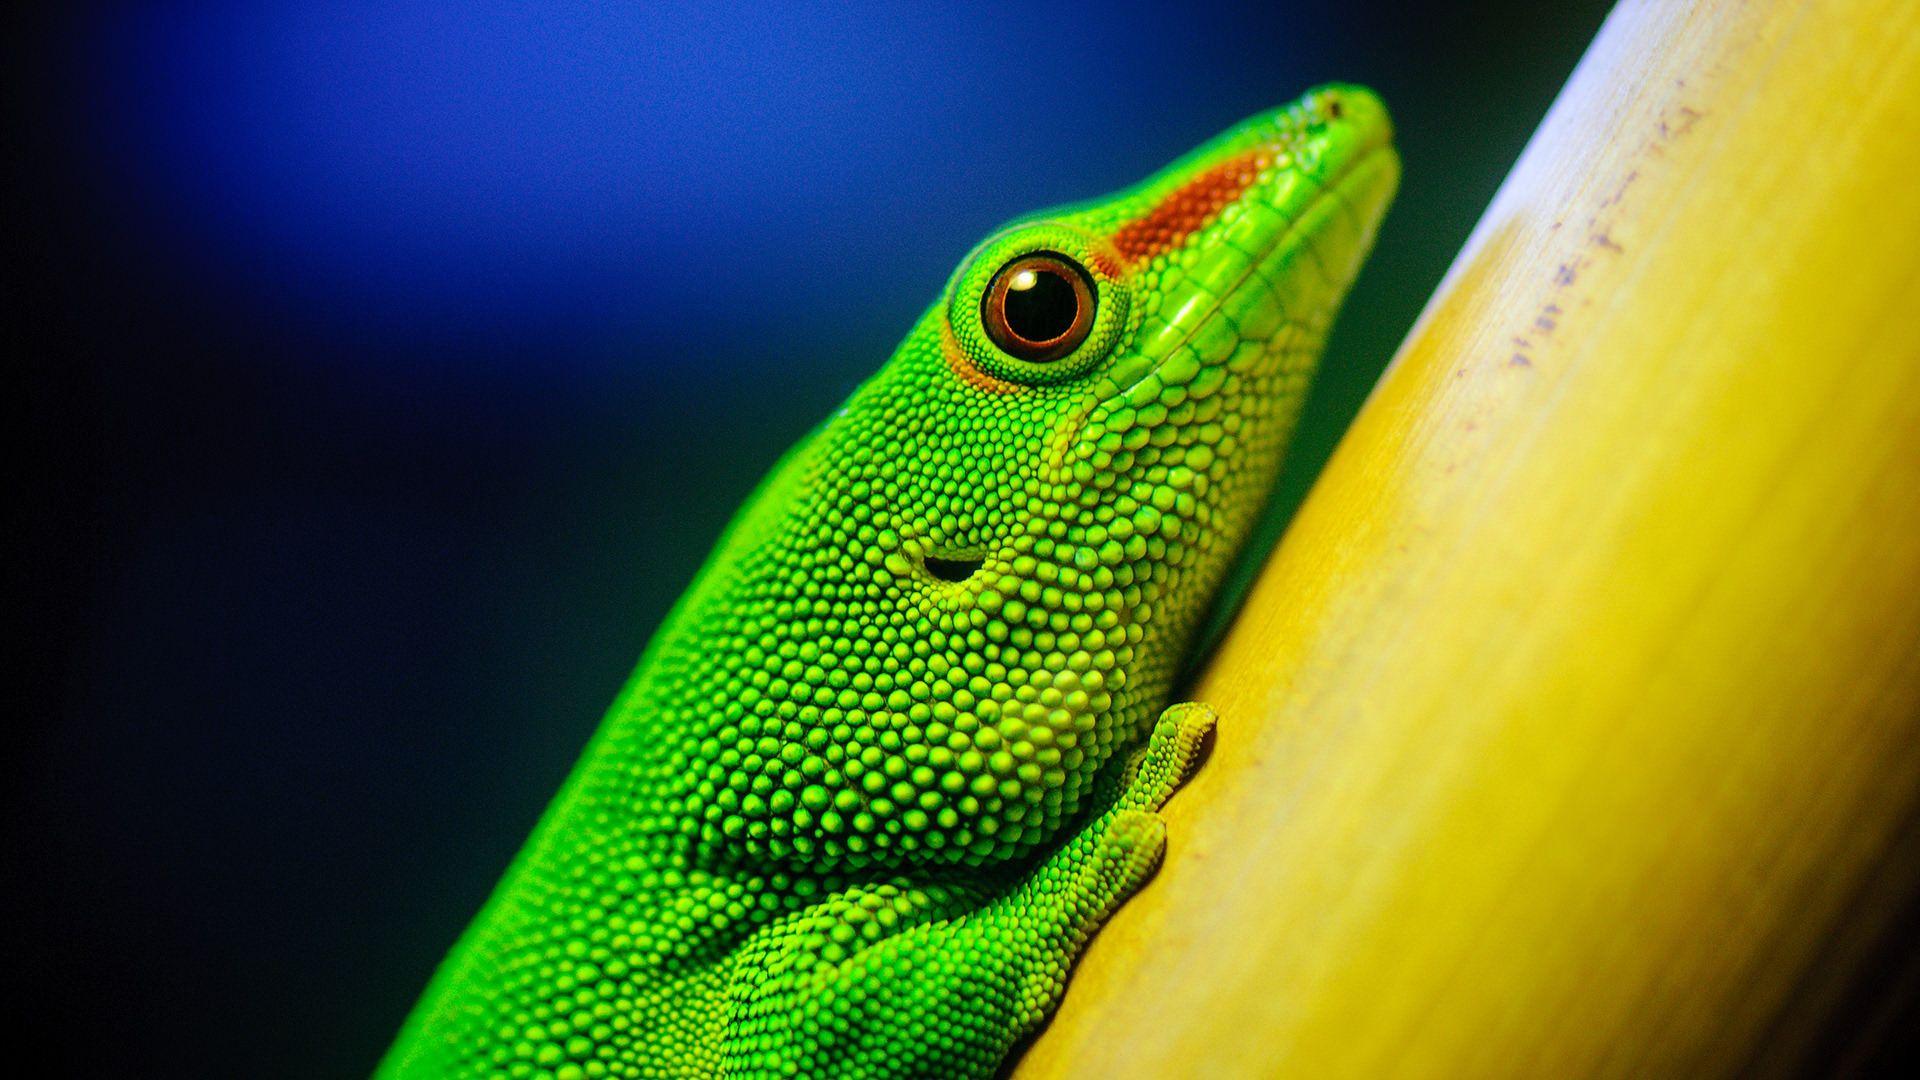 Green Lizard Macro Photography